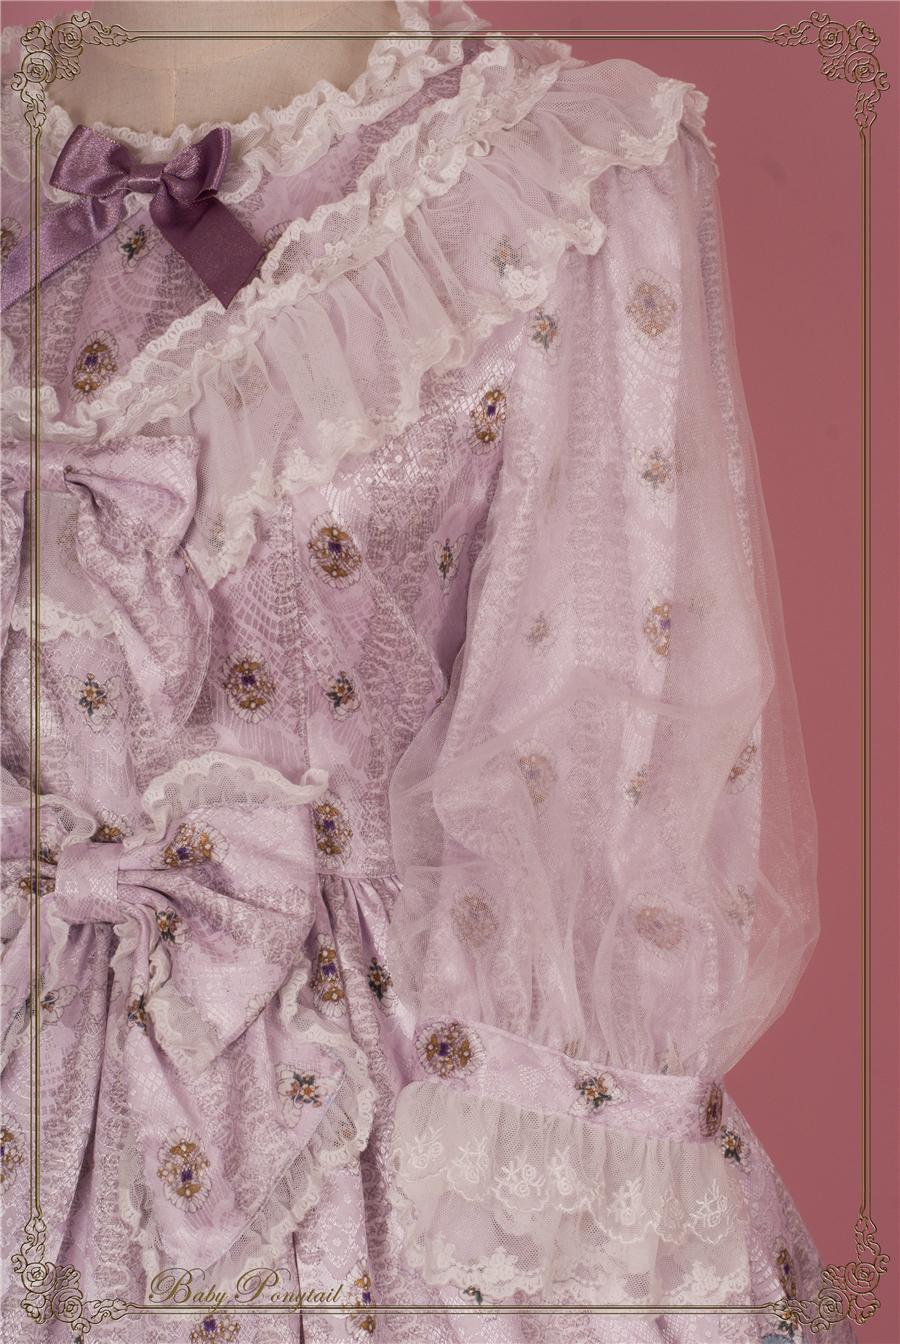 BabyPonytail_Stock Photo_My Favorite Companion_OP Lavender_05.jpg